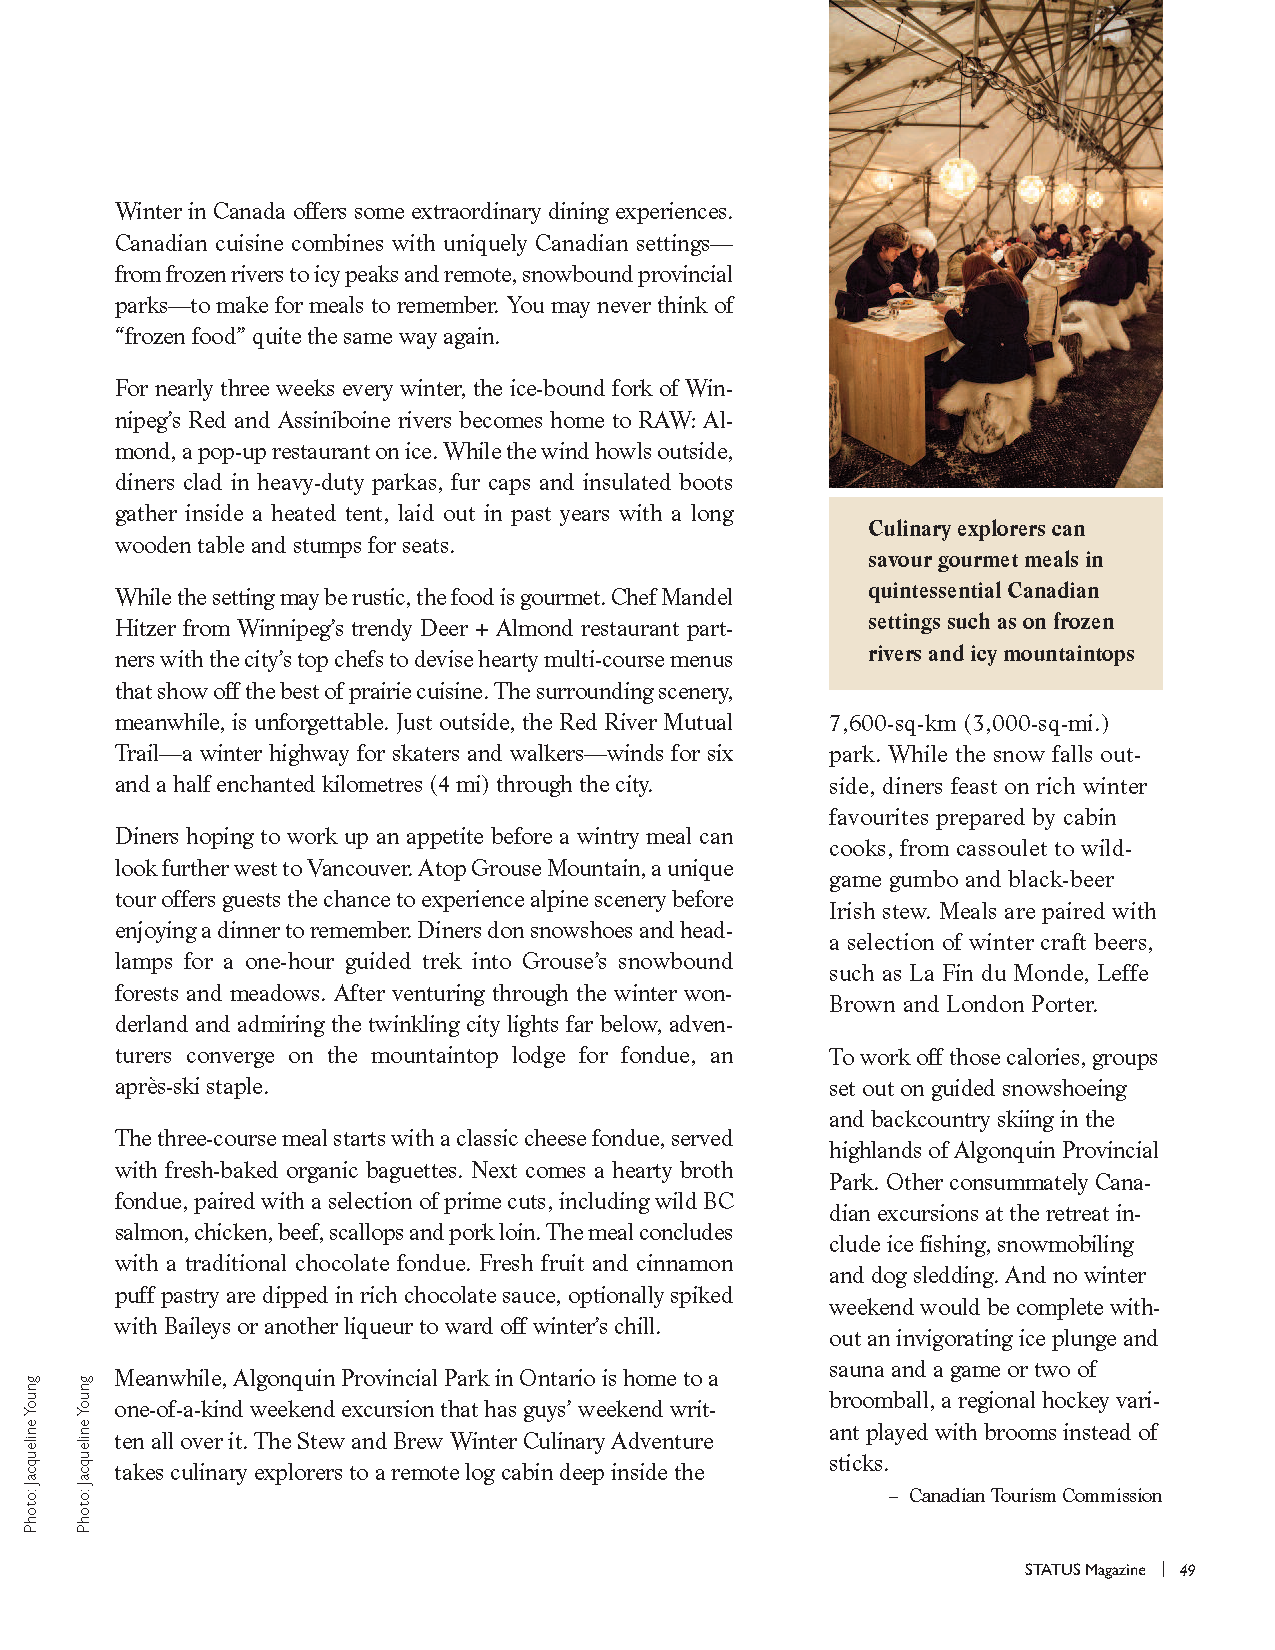 status-v15-magazine-january-2017_page_49